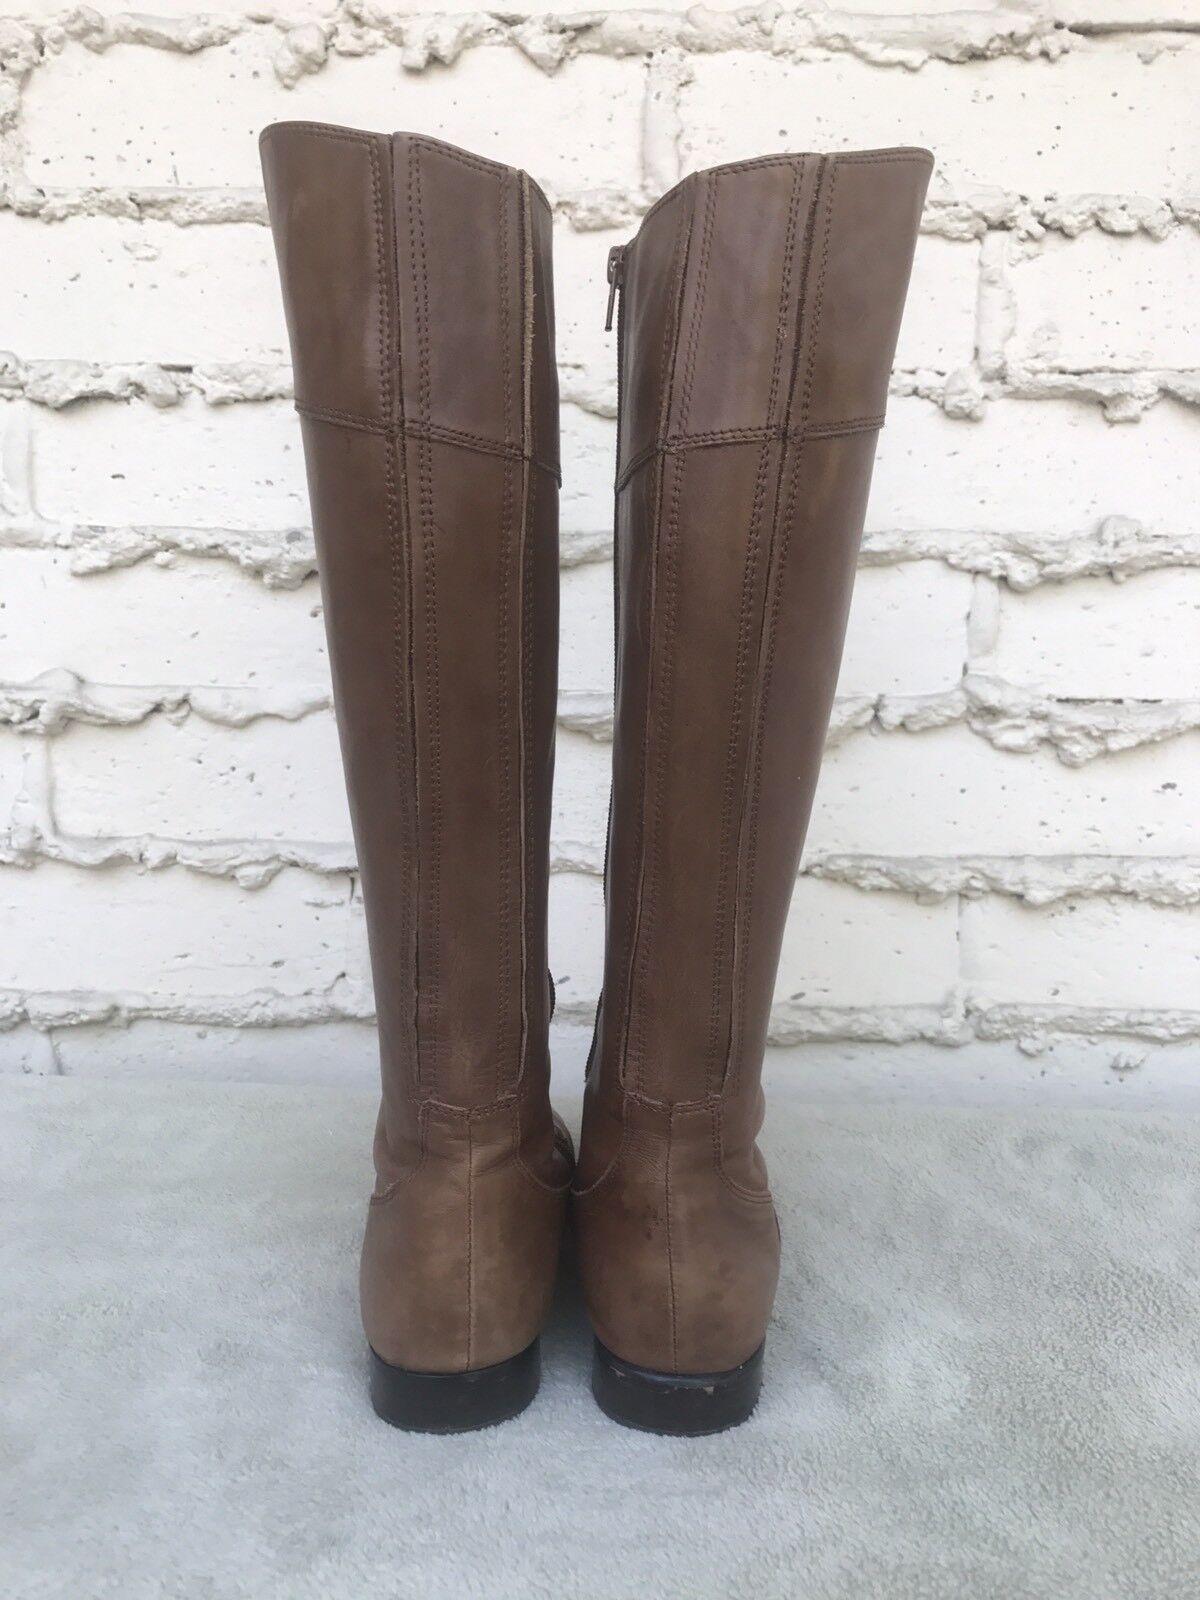 EUC CORSO COMO damen Riding Stiefel braun braun braun Leather Tall Knee High Größe US 7 M 302846